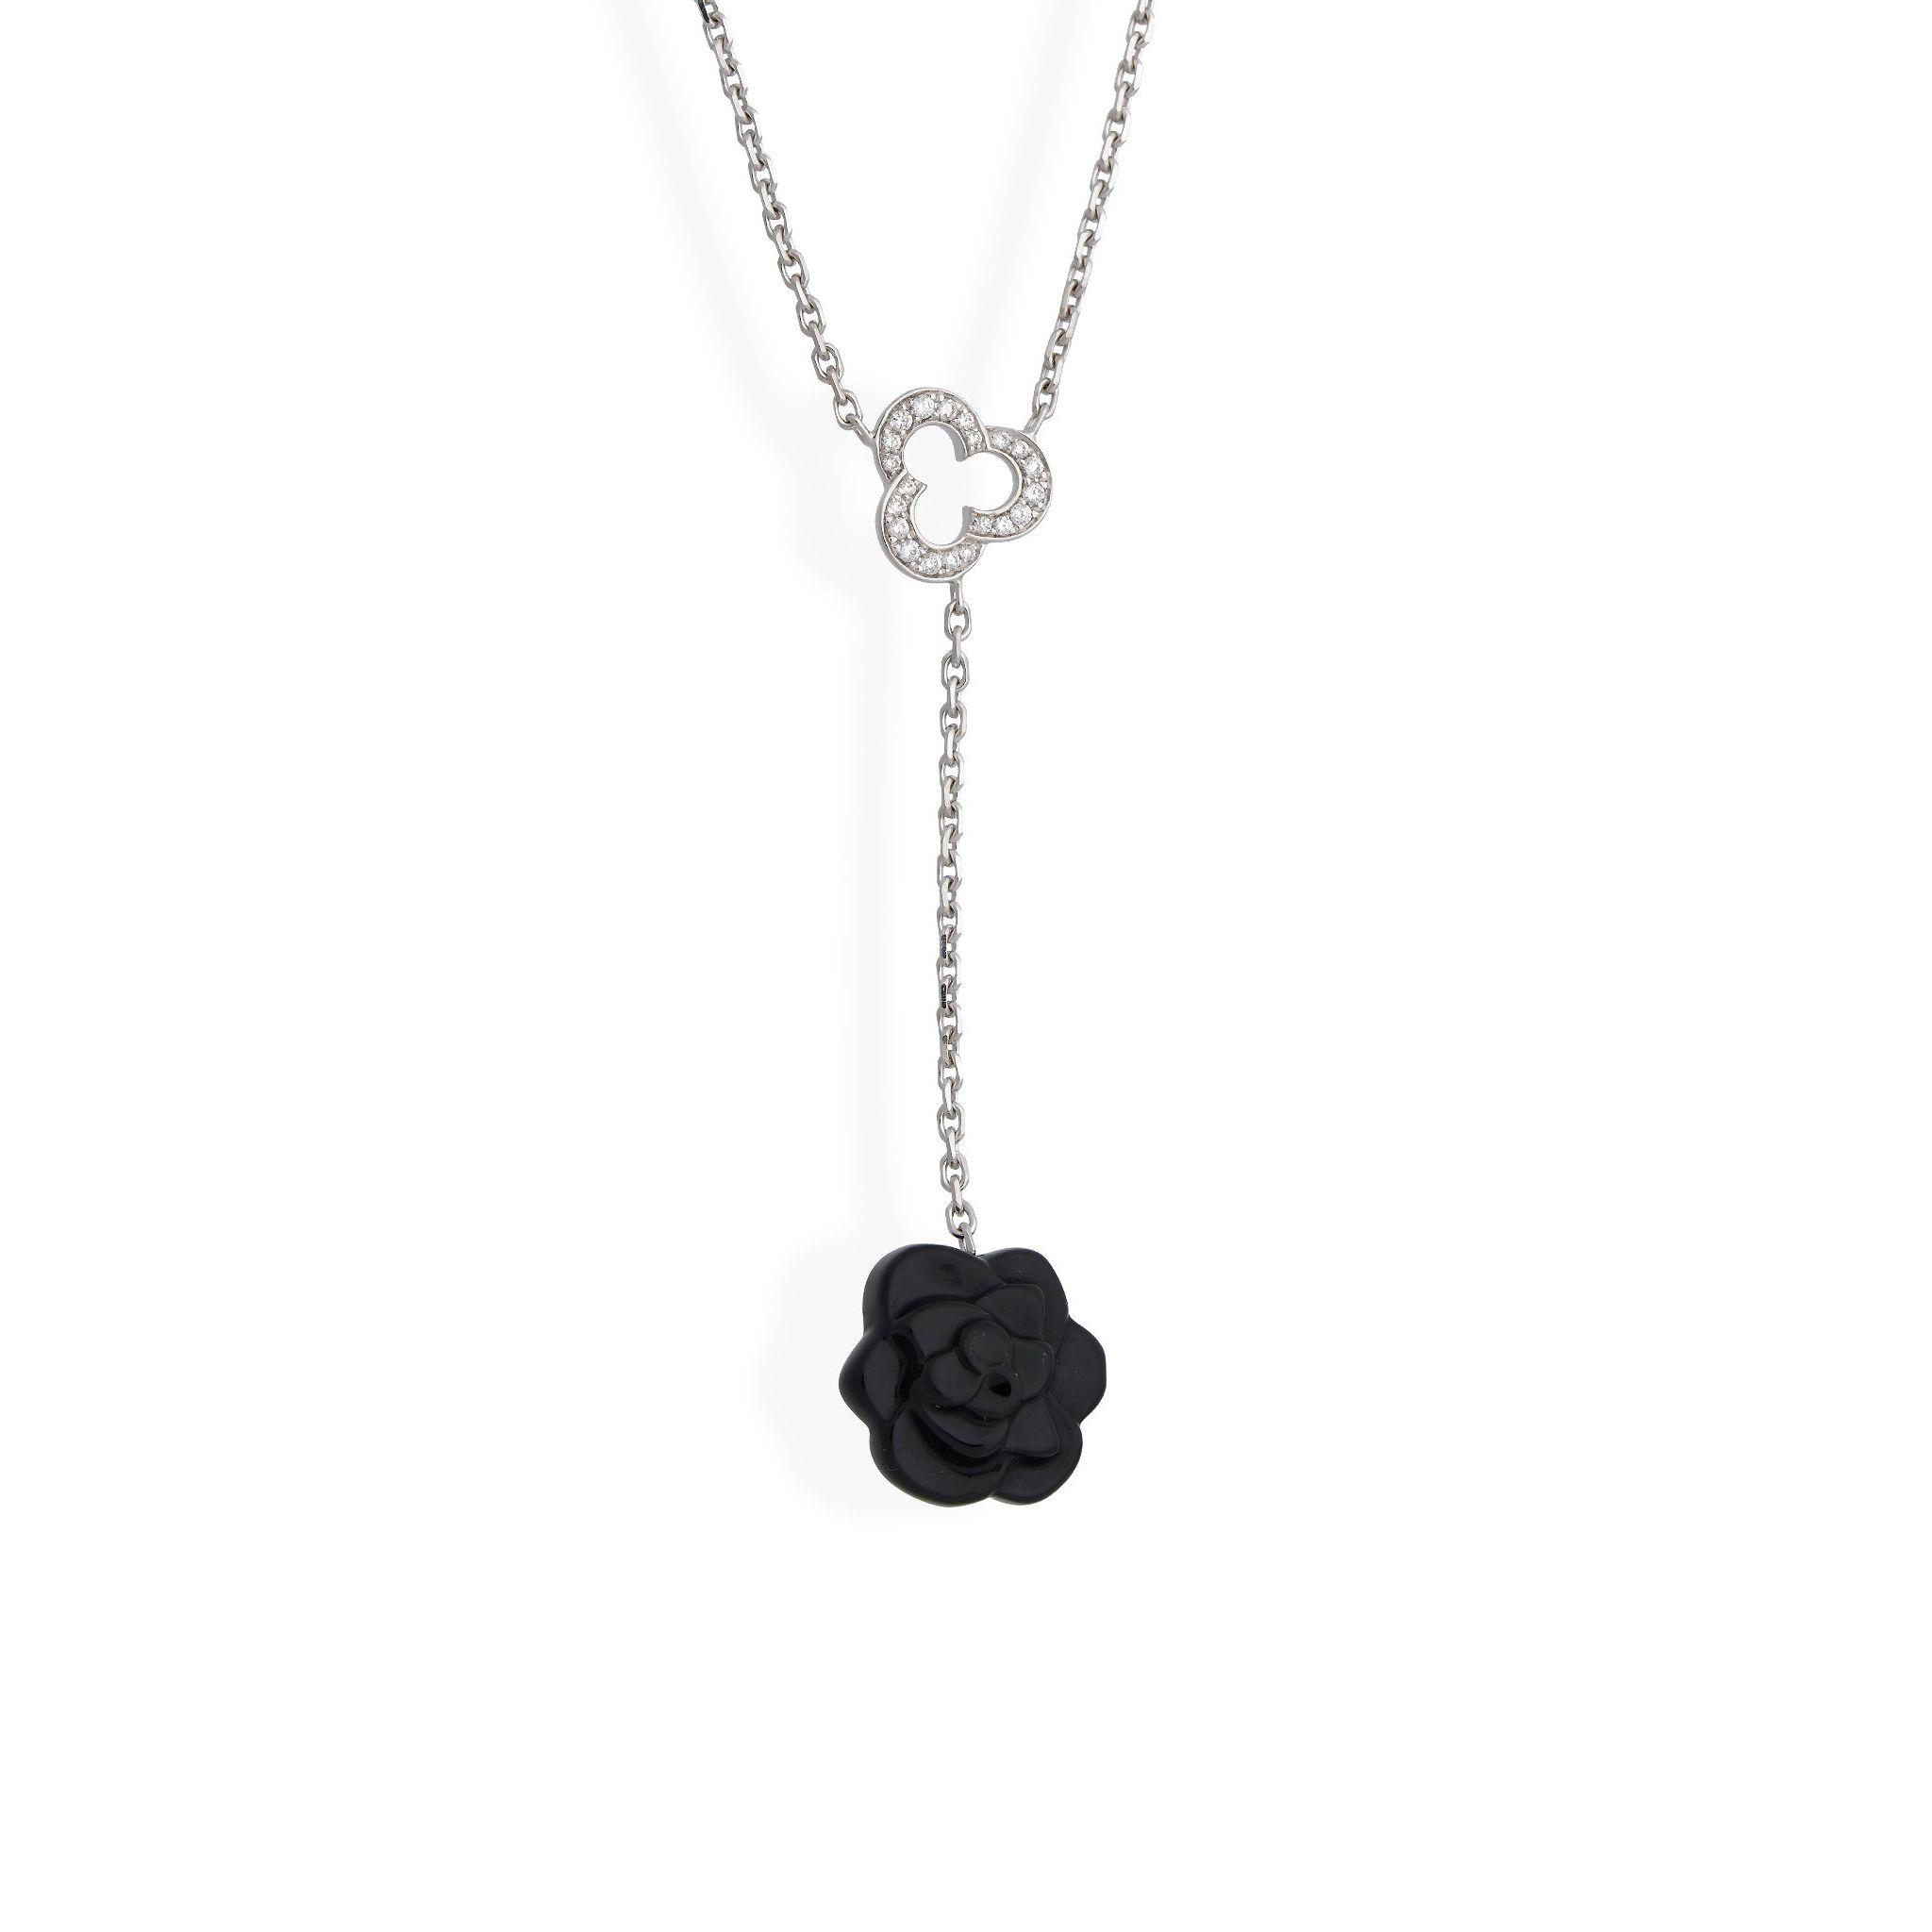 Chanel 18k White Gold Camelia Diamond Necklace Length 16 Jewelry Design Necklace Online Jewelry